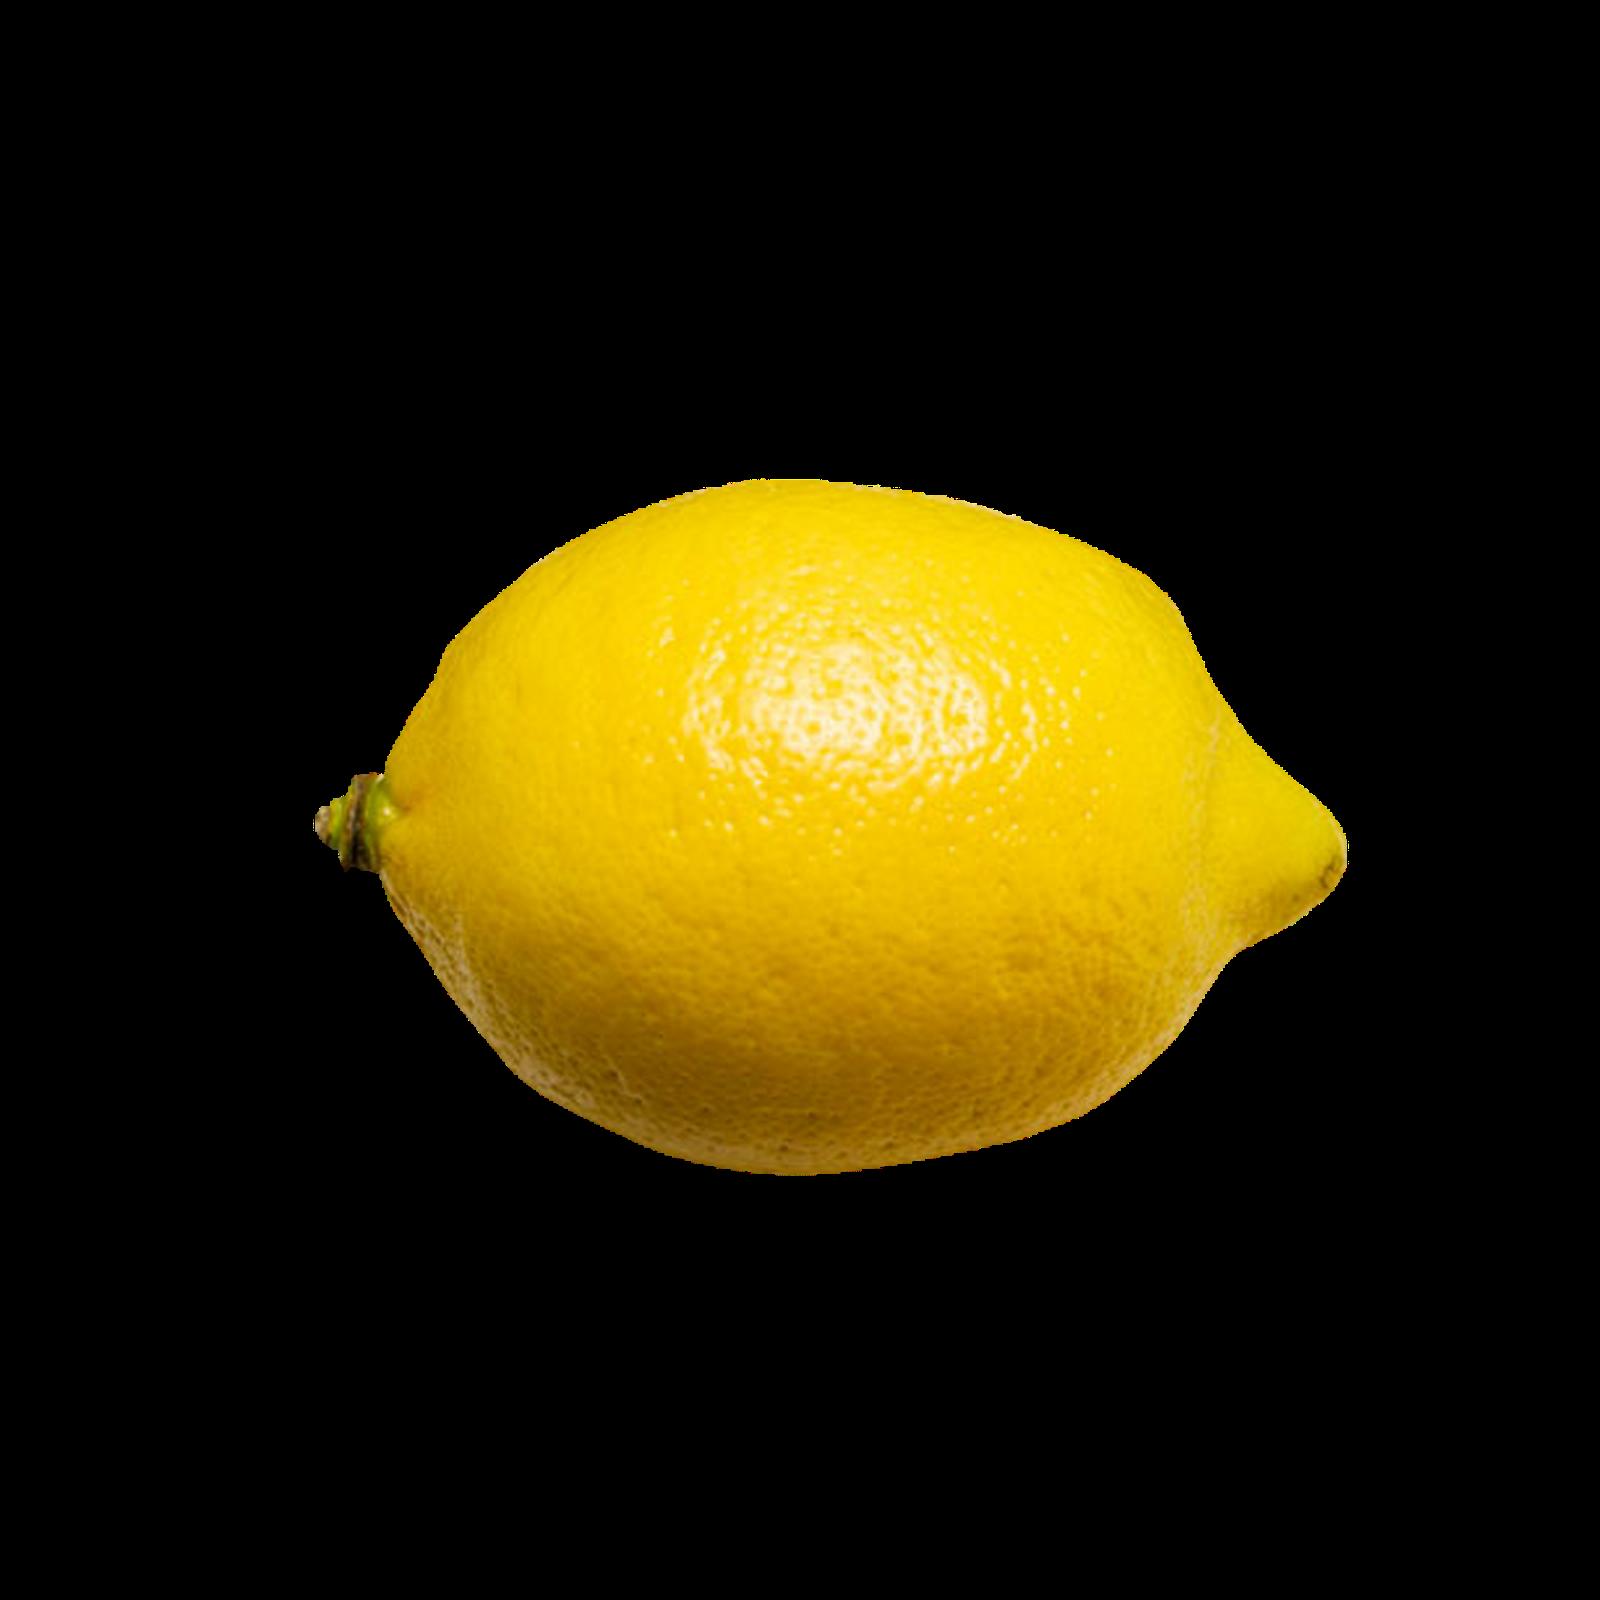 Своими, лимон картинки для детей на прозрачном фоне